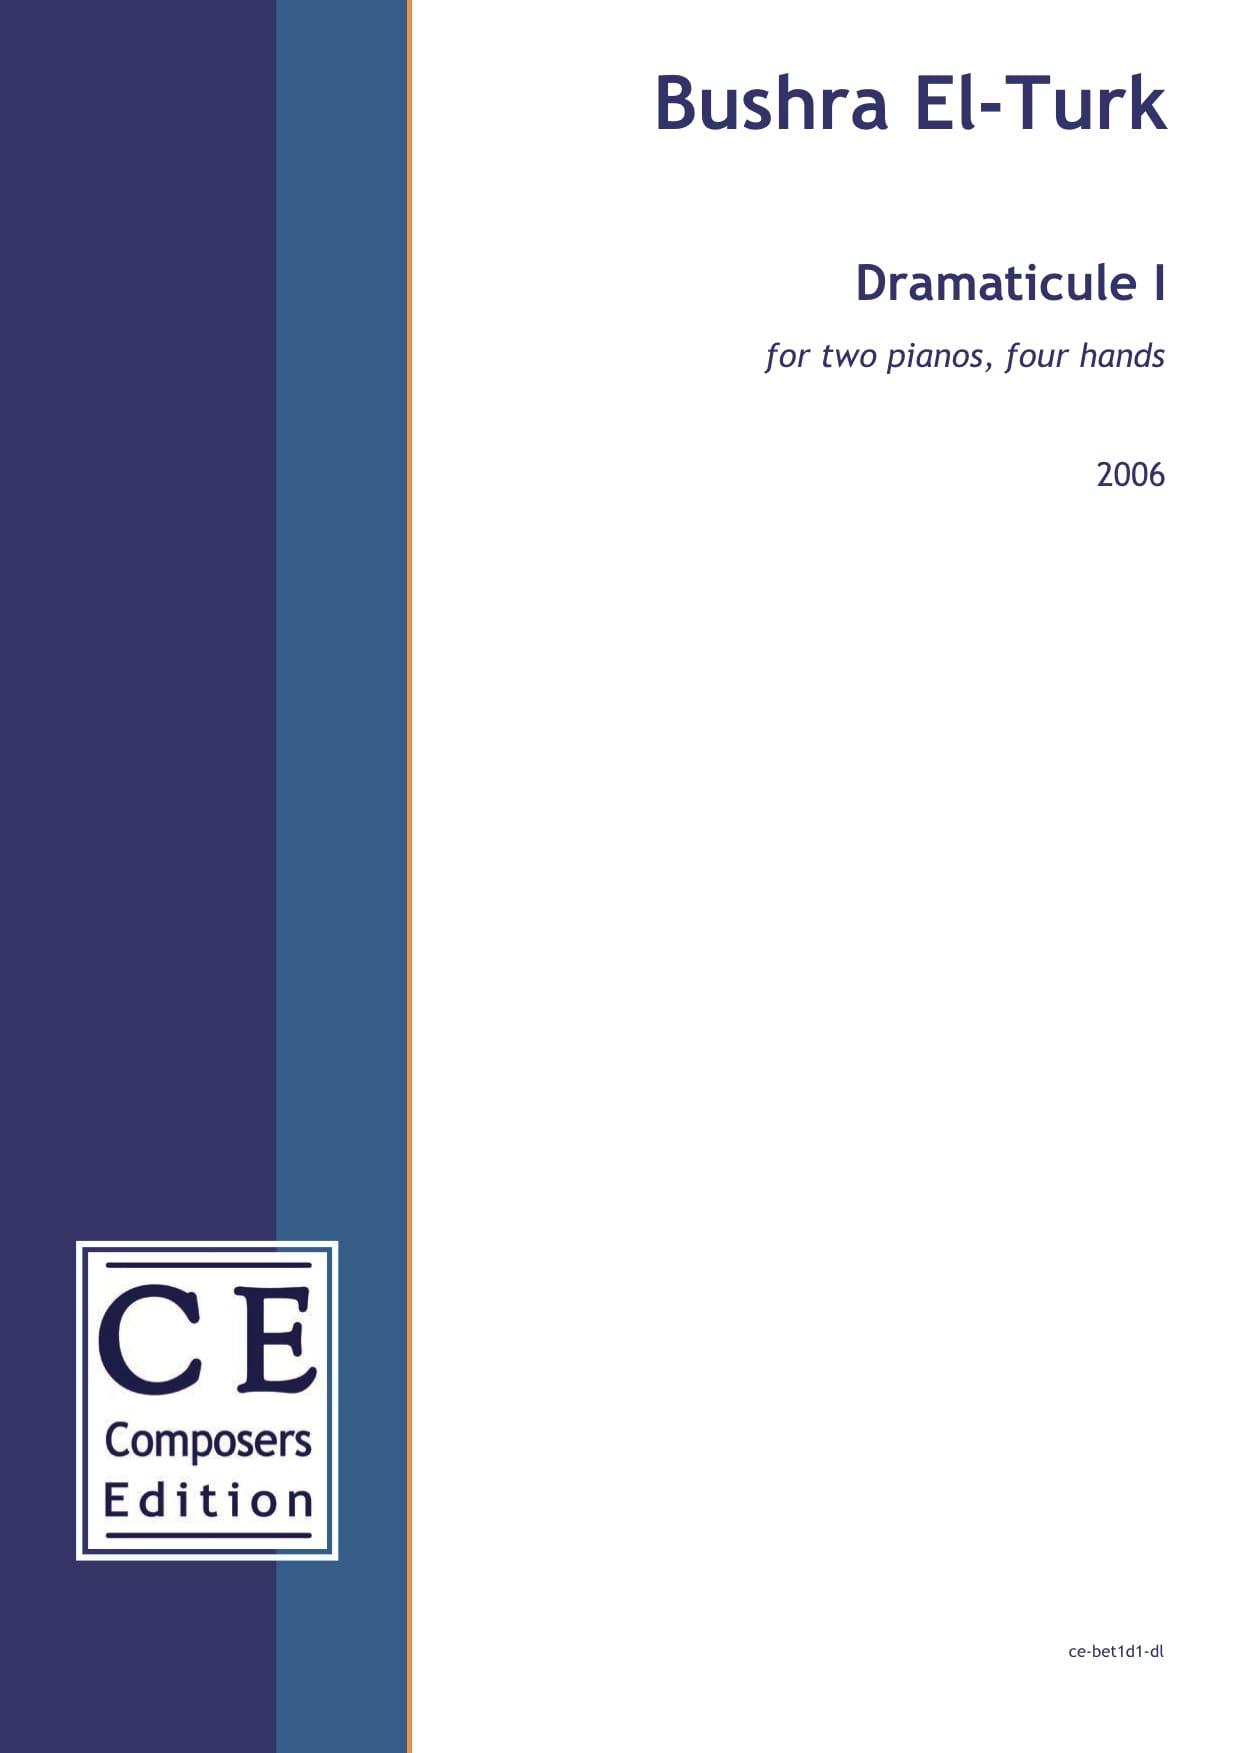 Bushra El-Turk: Dramaticule I for two pianos, four hands